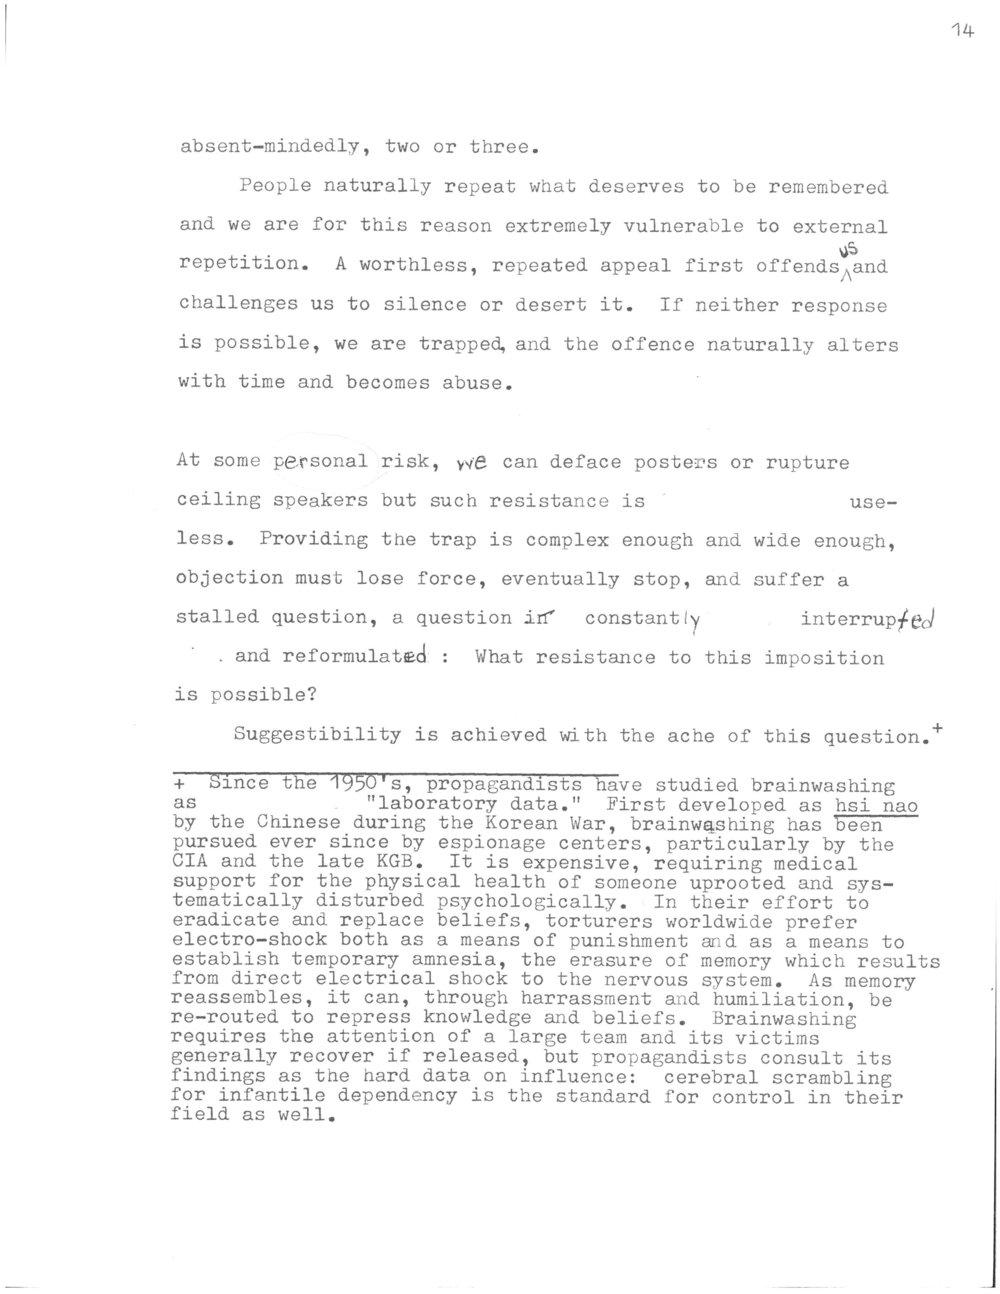 Propaganda_Page_16.jpg